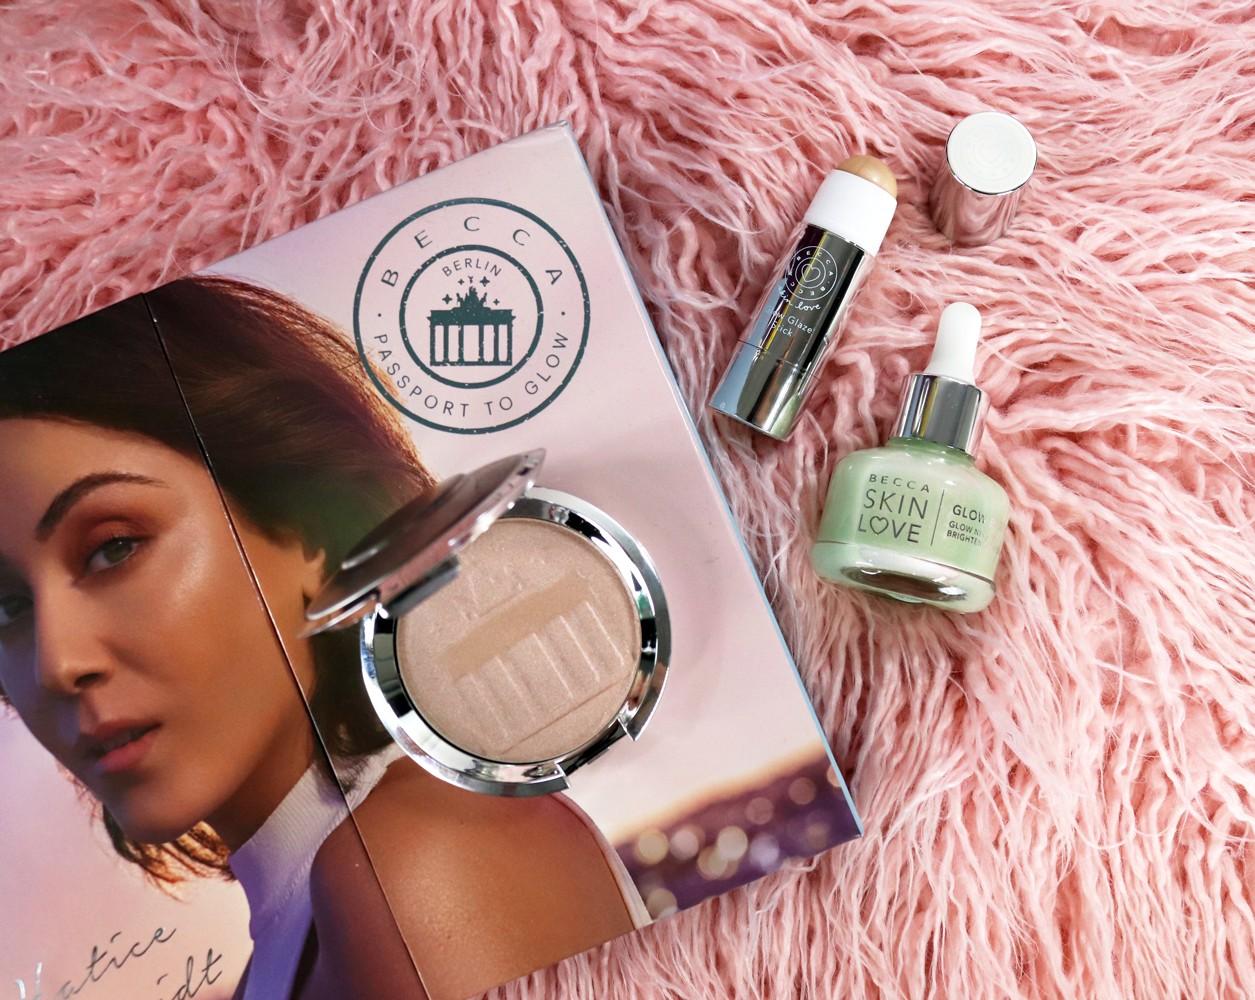 Becca Highlighter Hatrice Berlin Girl Glow and Skin Love Glow Elixir and Glow Glaze Stick